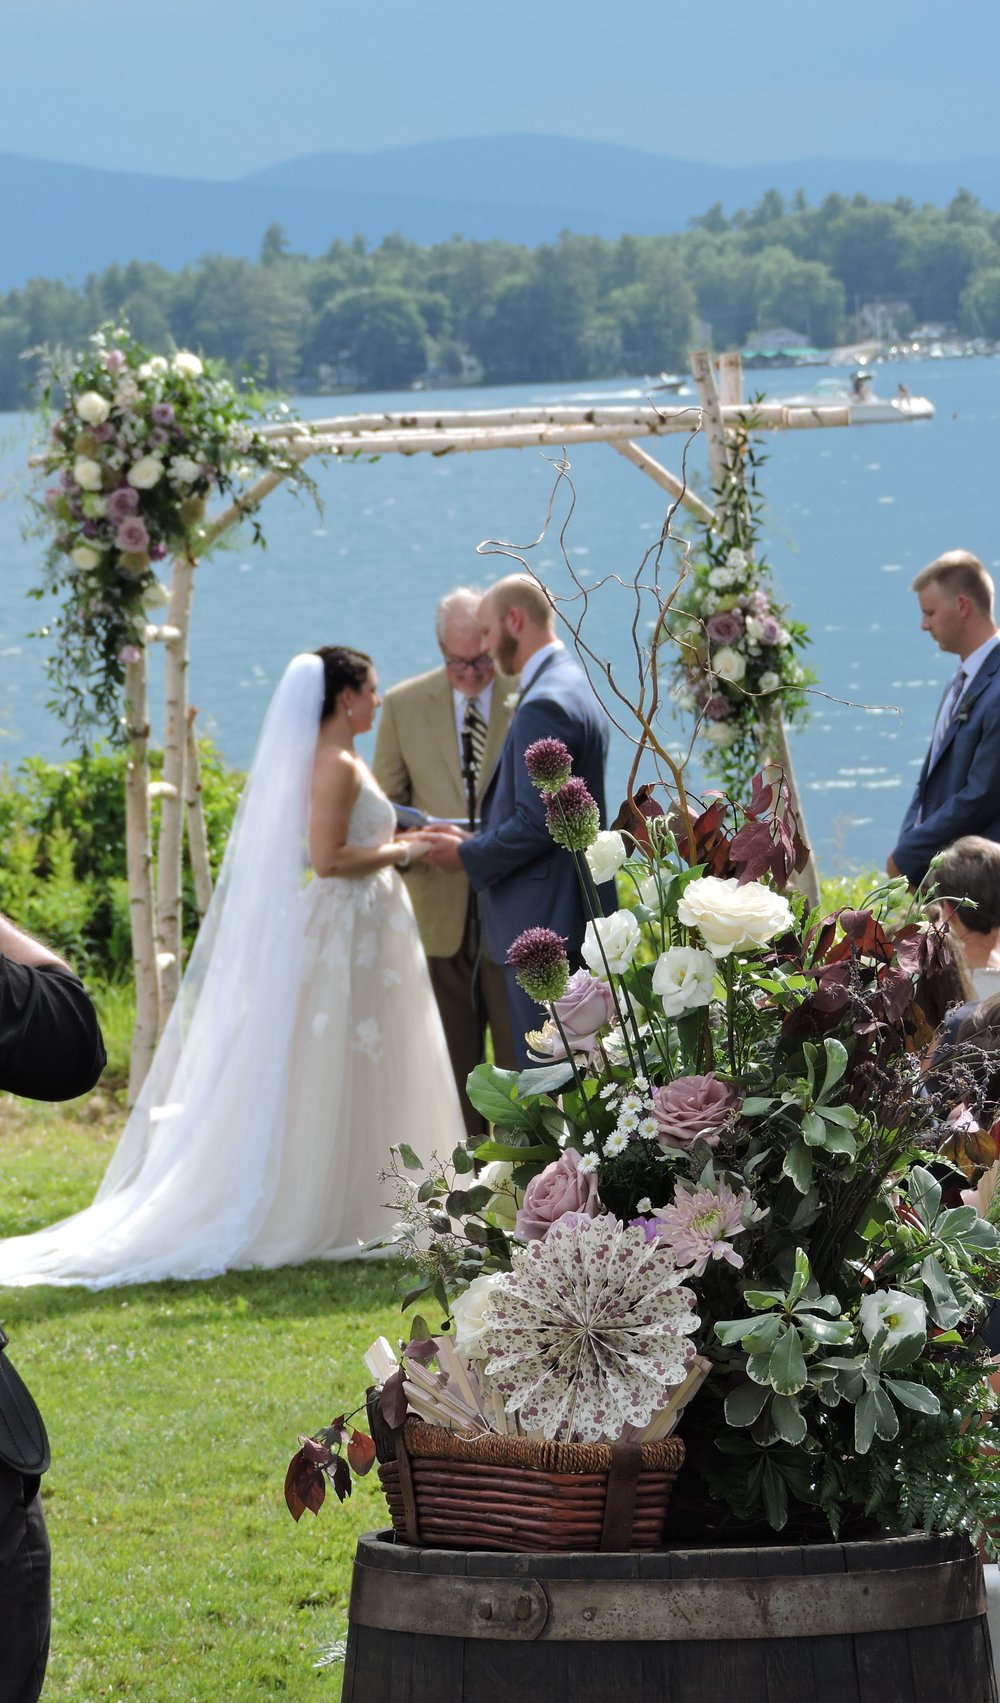 Wedding at Brewster Academy, NH with birch arbor on Lake Winnipesaukee